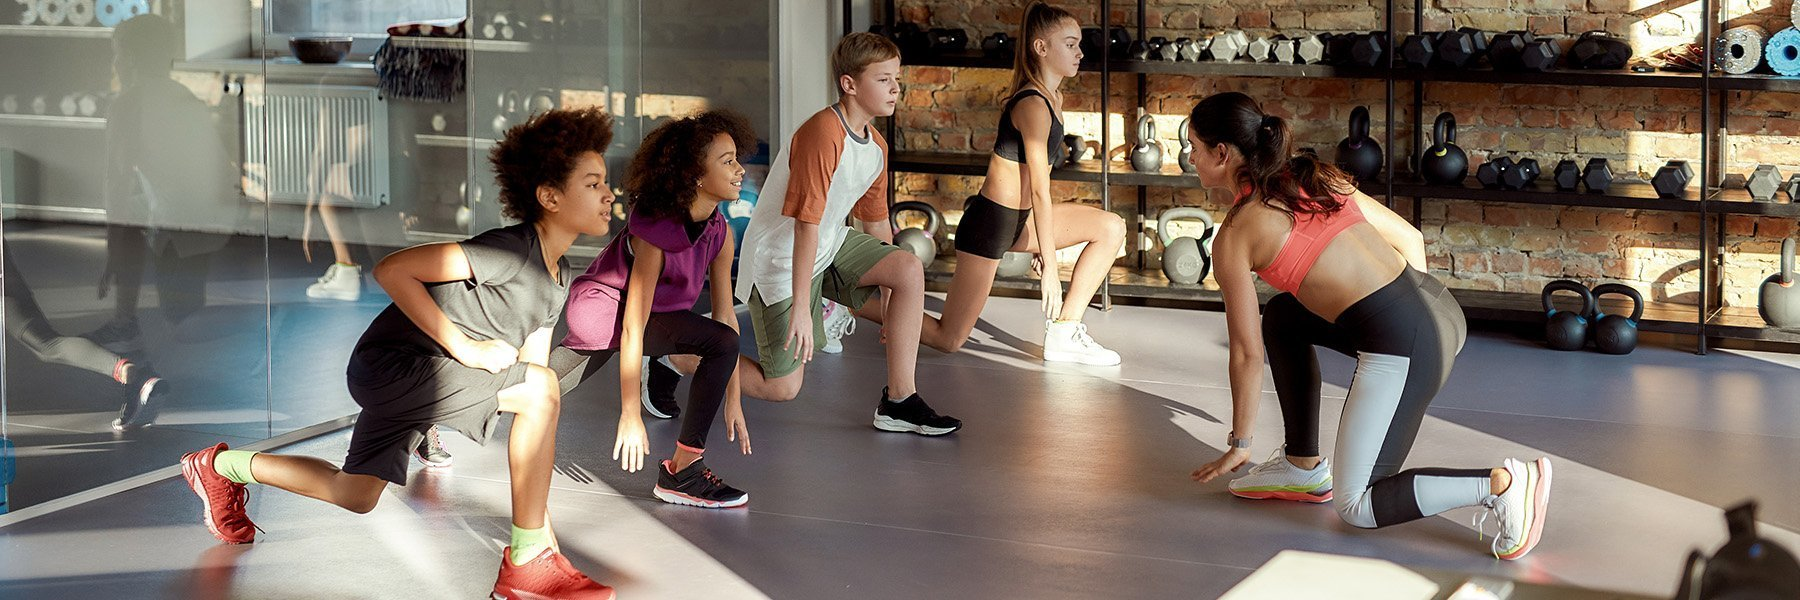 Rubber Fitness Flooring